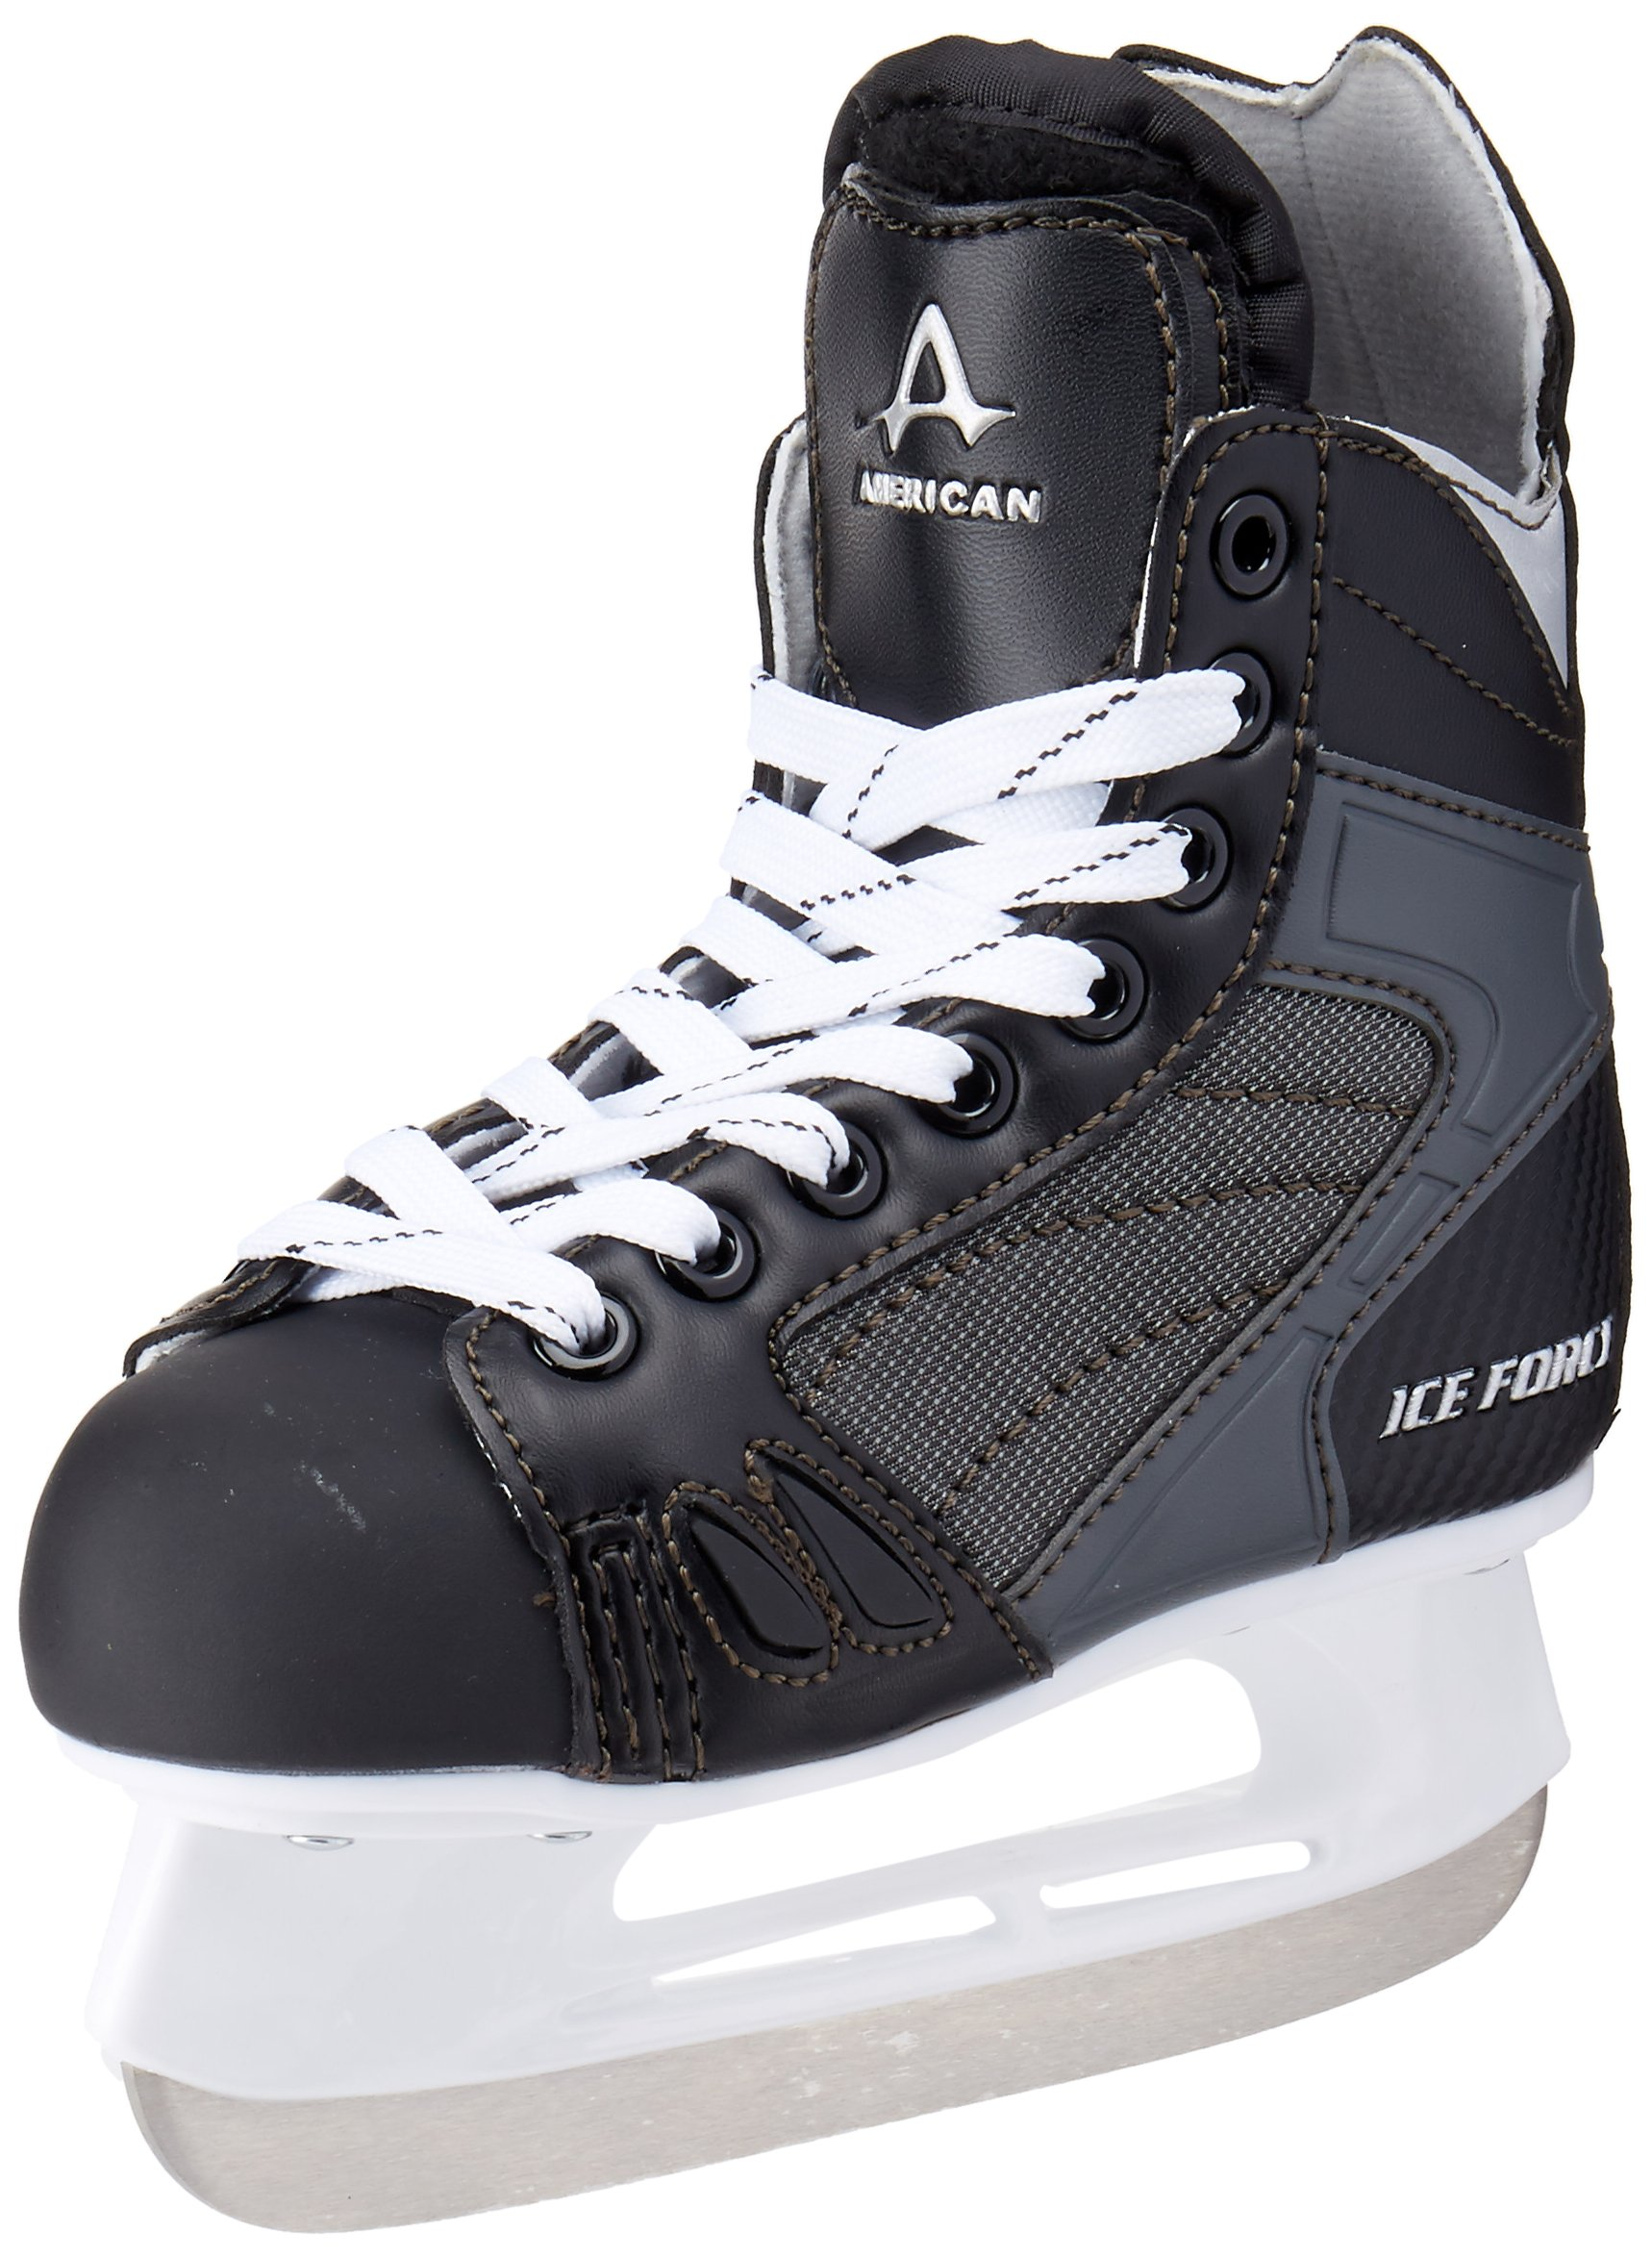 American Athletic Shoe Boy's Ice Force Hockey Skates, Black, 1 Y